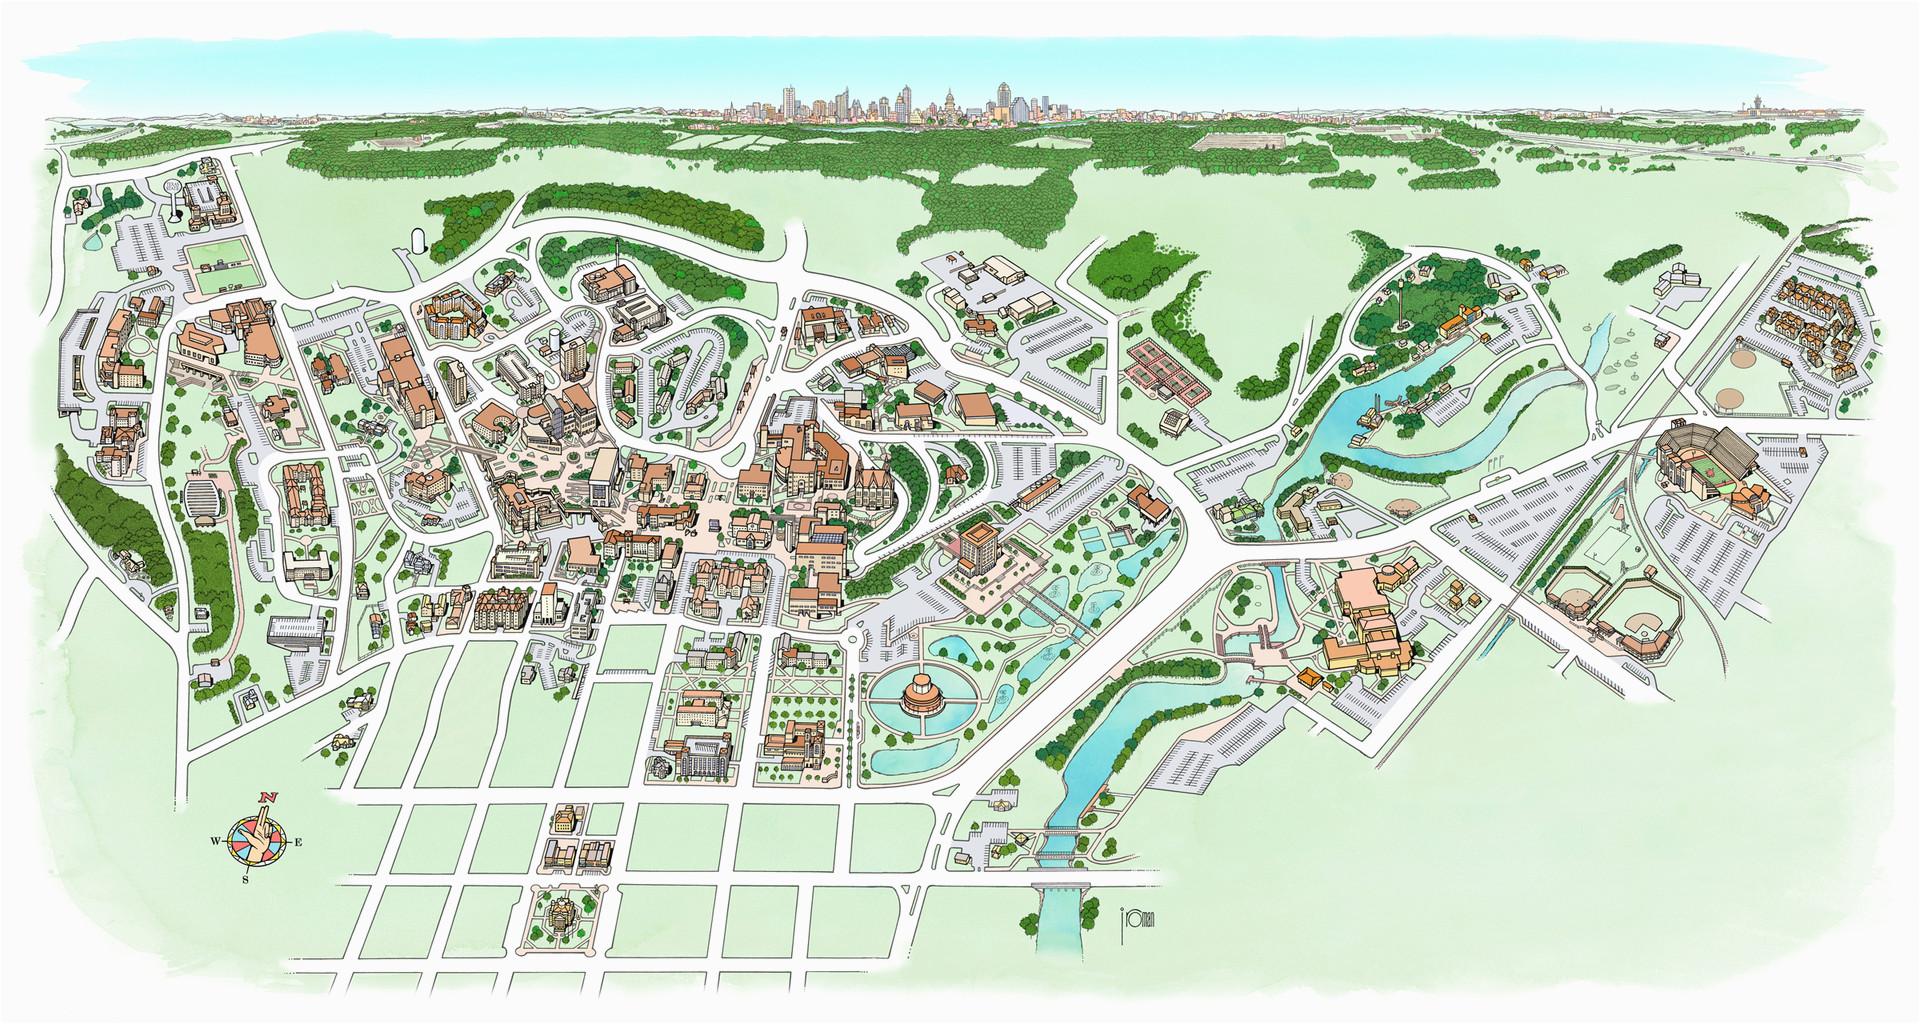 Michigan State Parking Map | secretmuseum on city of iowa campus map, lake delhi ia map, isu campus map, north carolina a&t campus map, ia state amtrak map, iowa university map, iowa state map, gardner webb campus map,